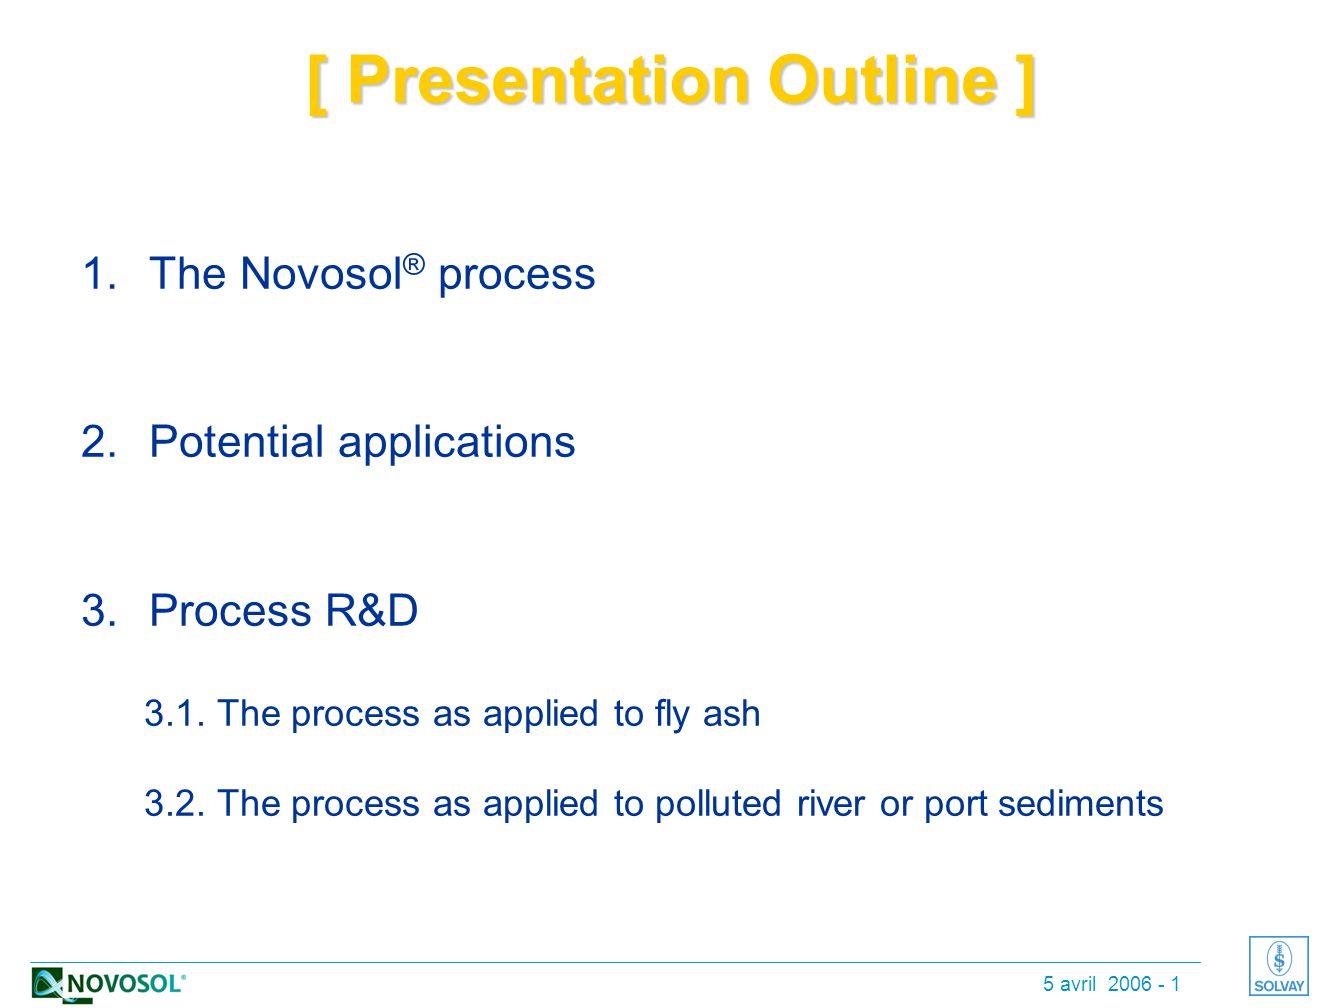 5 avril 2006 - 1 [ Presentation Outline ] 1.The Novosol ® process 2.Potential applications 3.Process R&D 3.1.